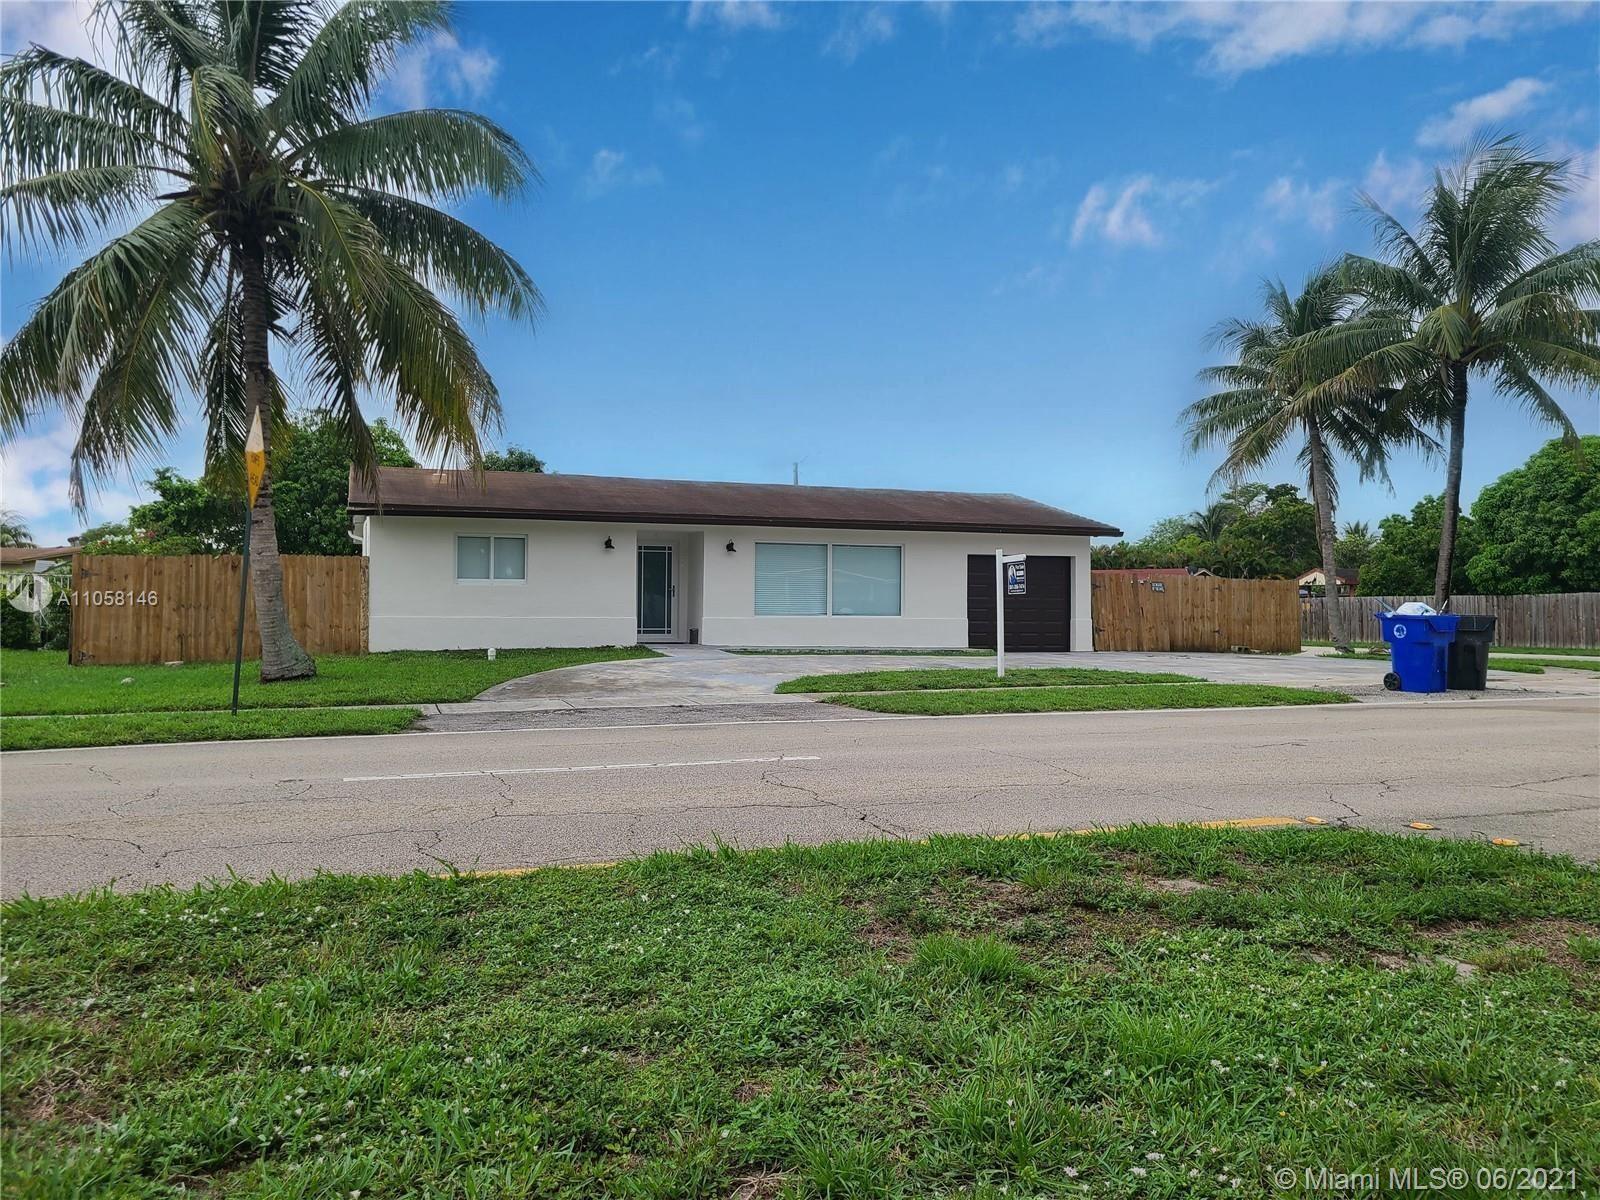 6790 Kimberly Blvd, North Lauderdale, FL 33068 - #: A11058146